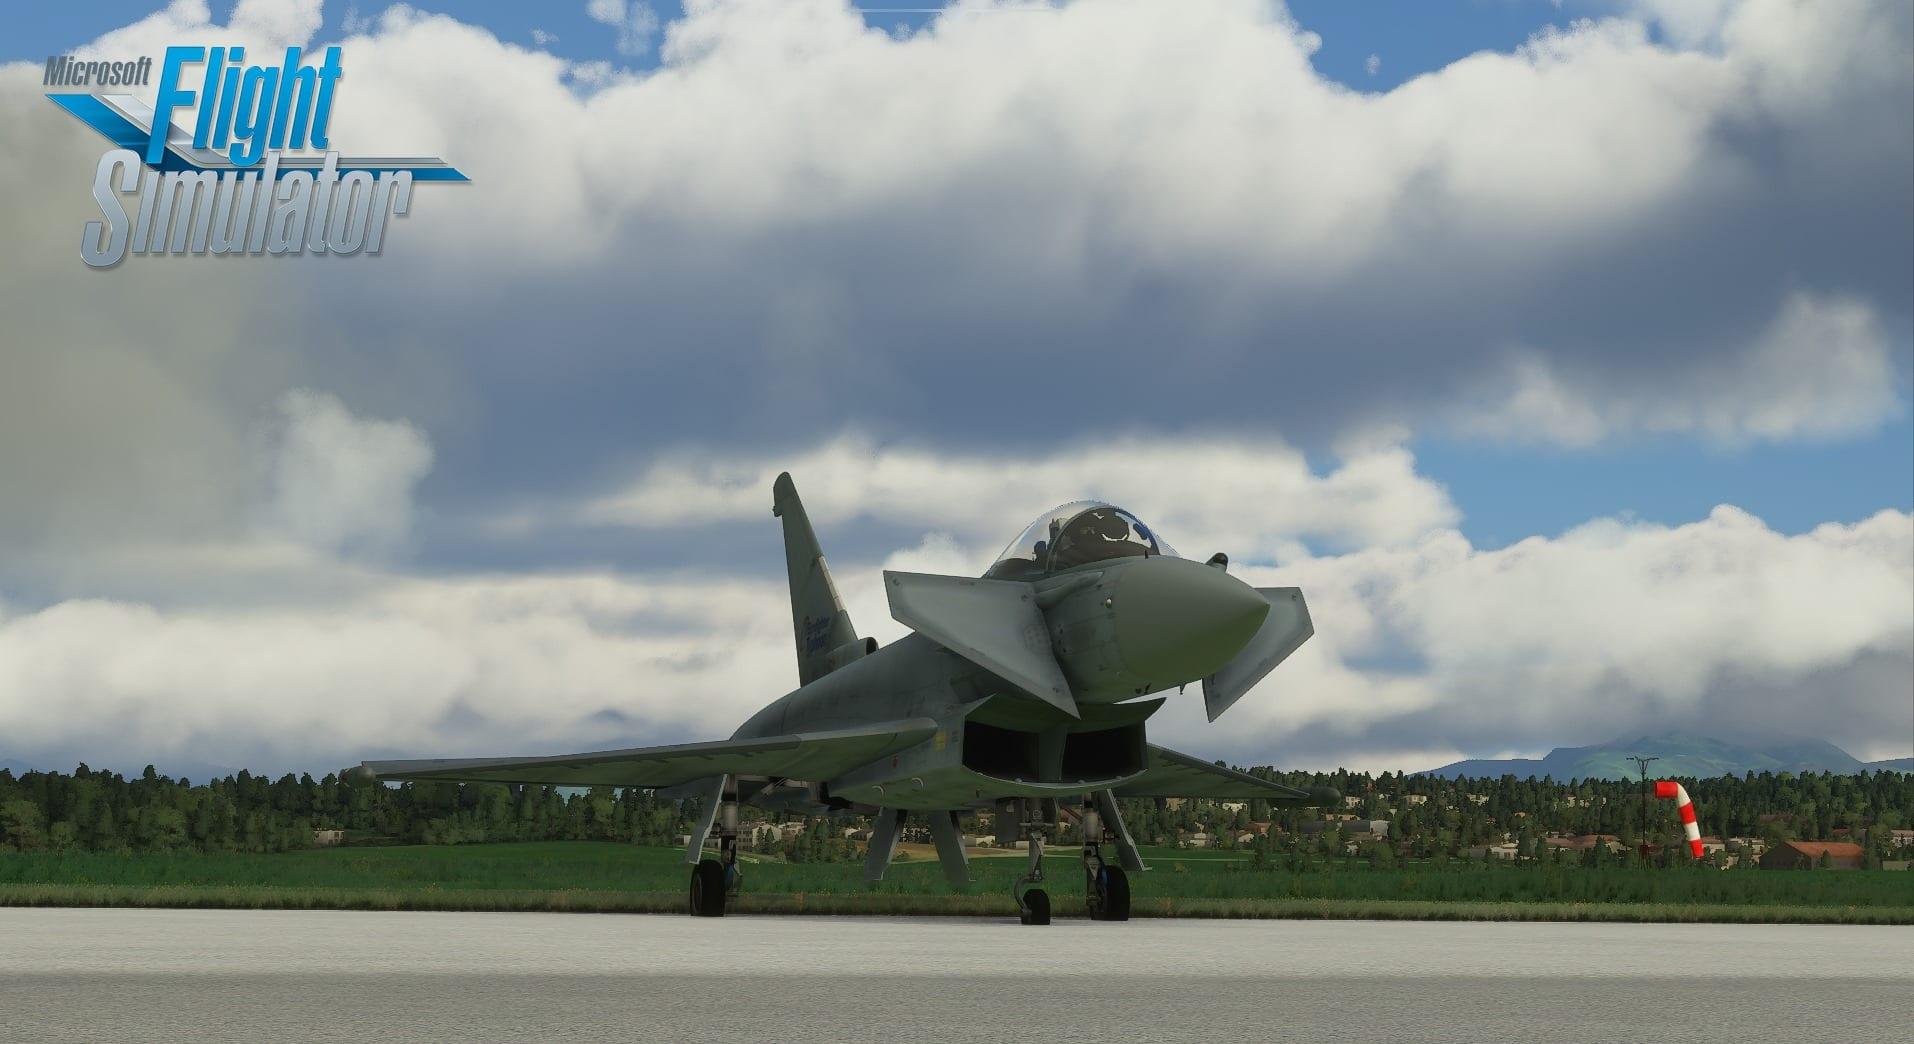 Microsoft Flight Simulator Add-On Plans & Extra Plane Introduced by MB-339 Developer 1